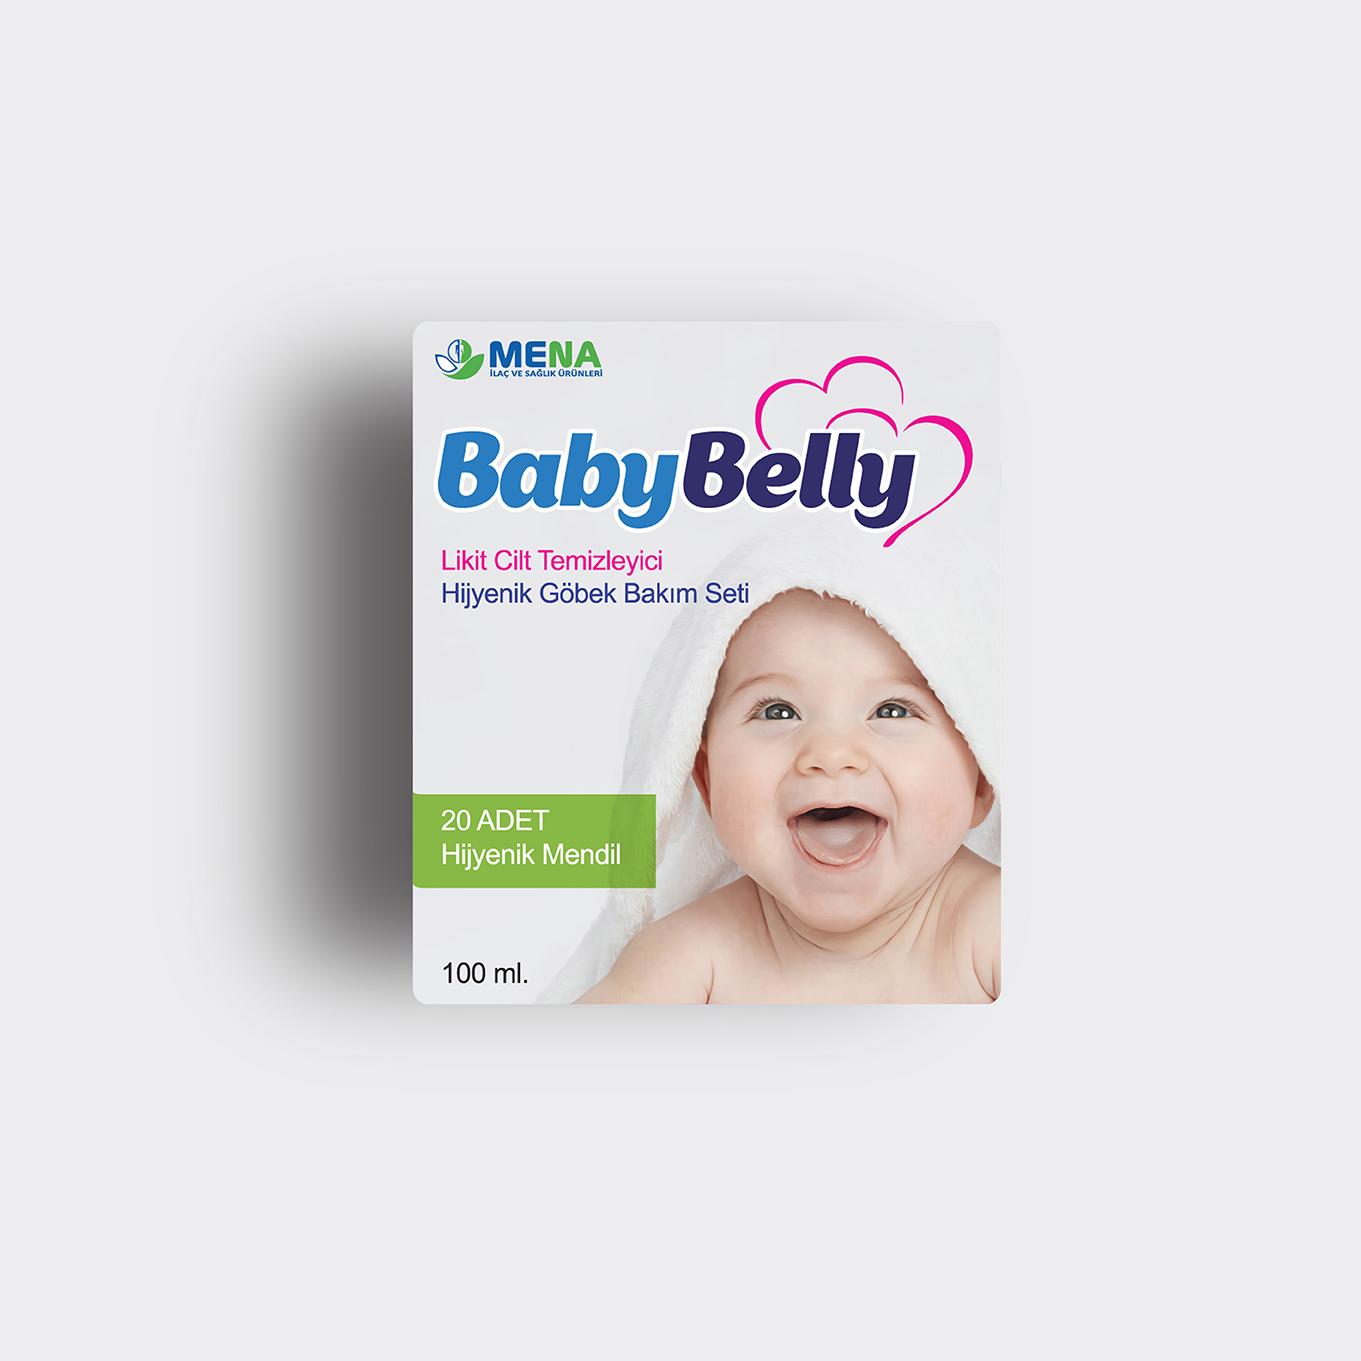 babybelly-gobek-bakim-seti-kutu-tasarimi